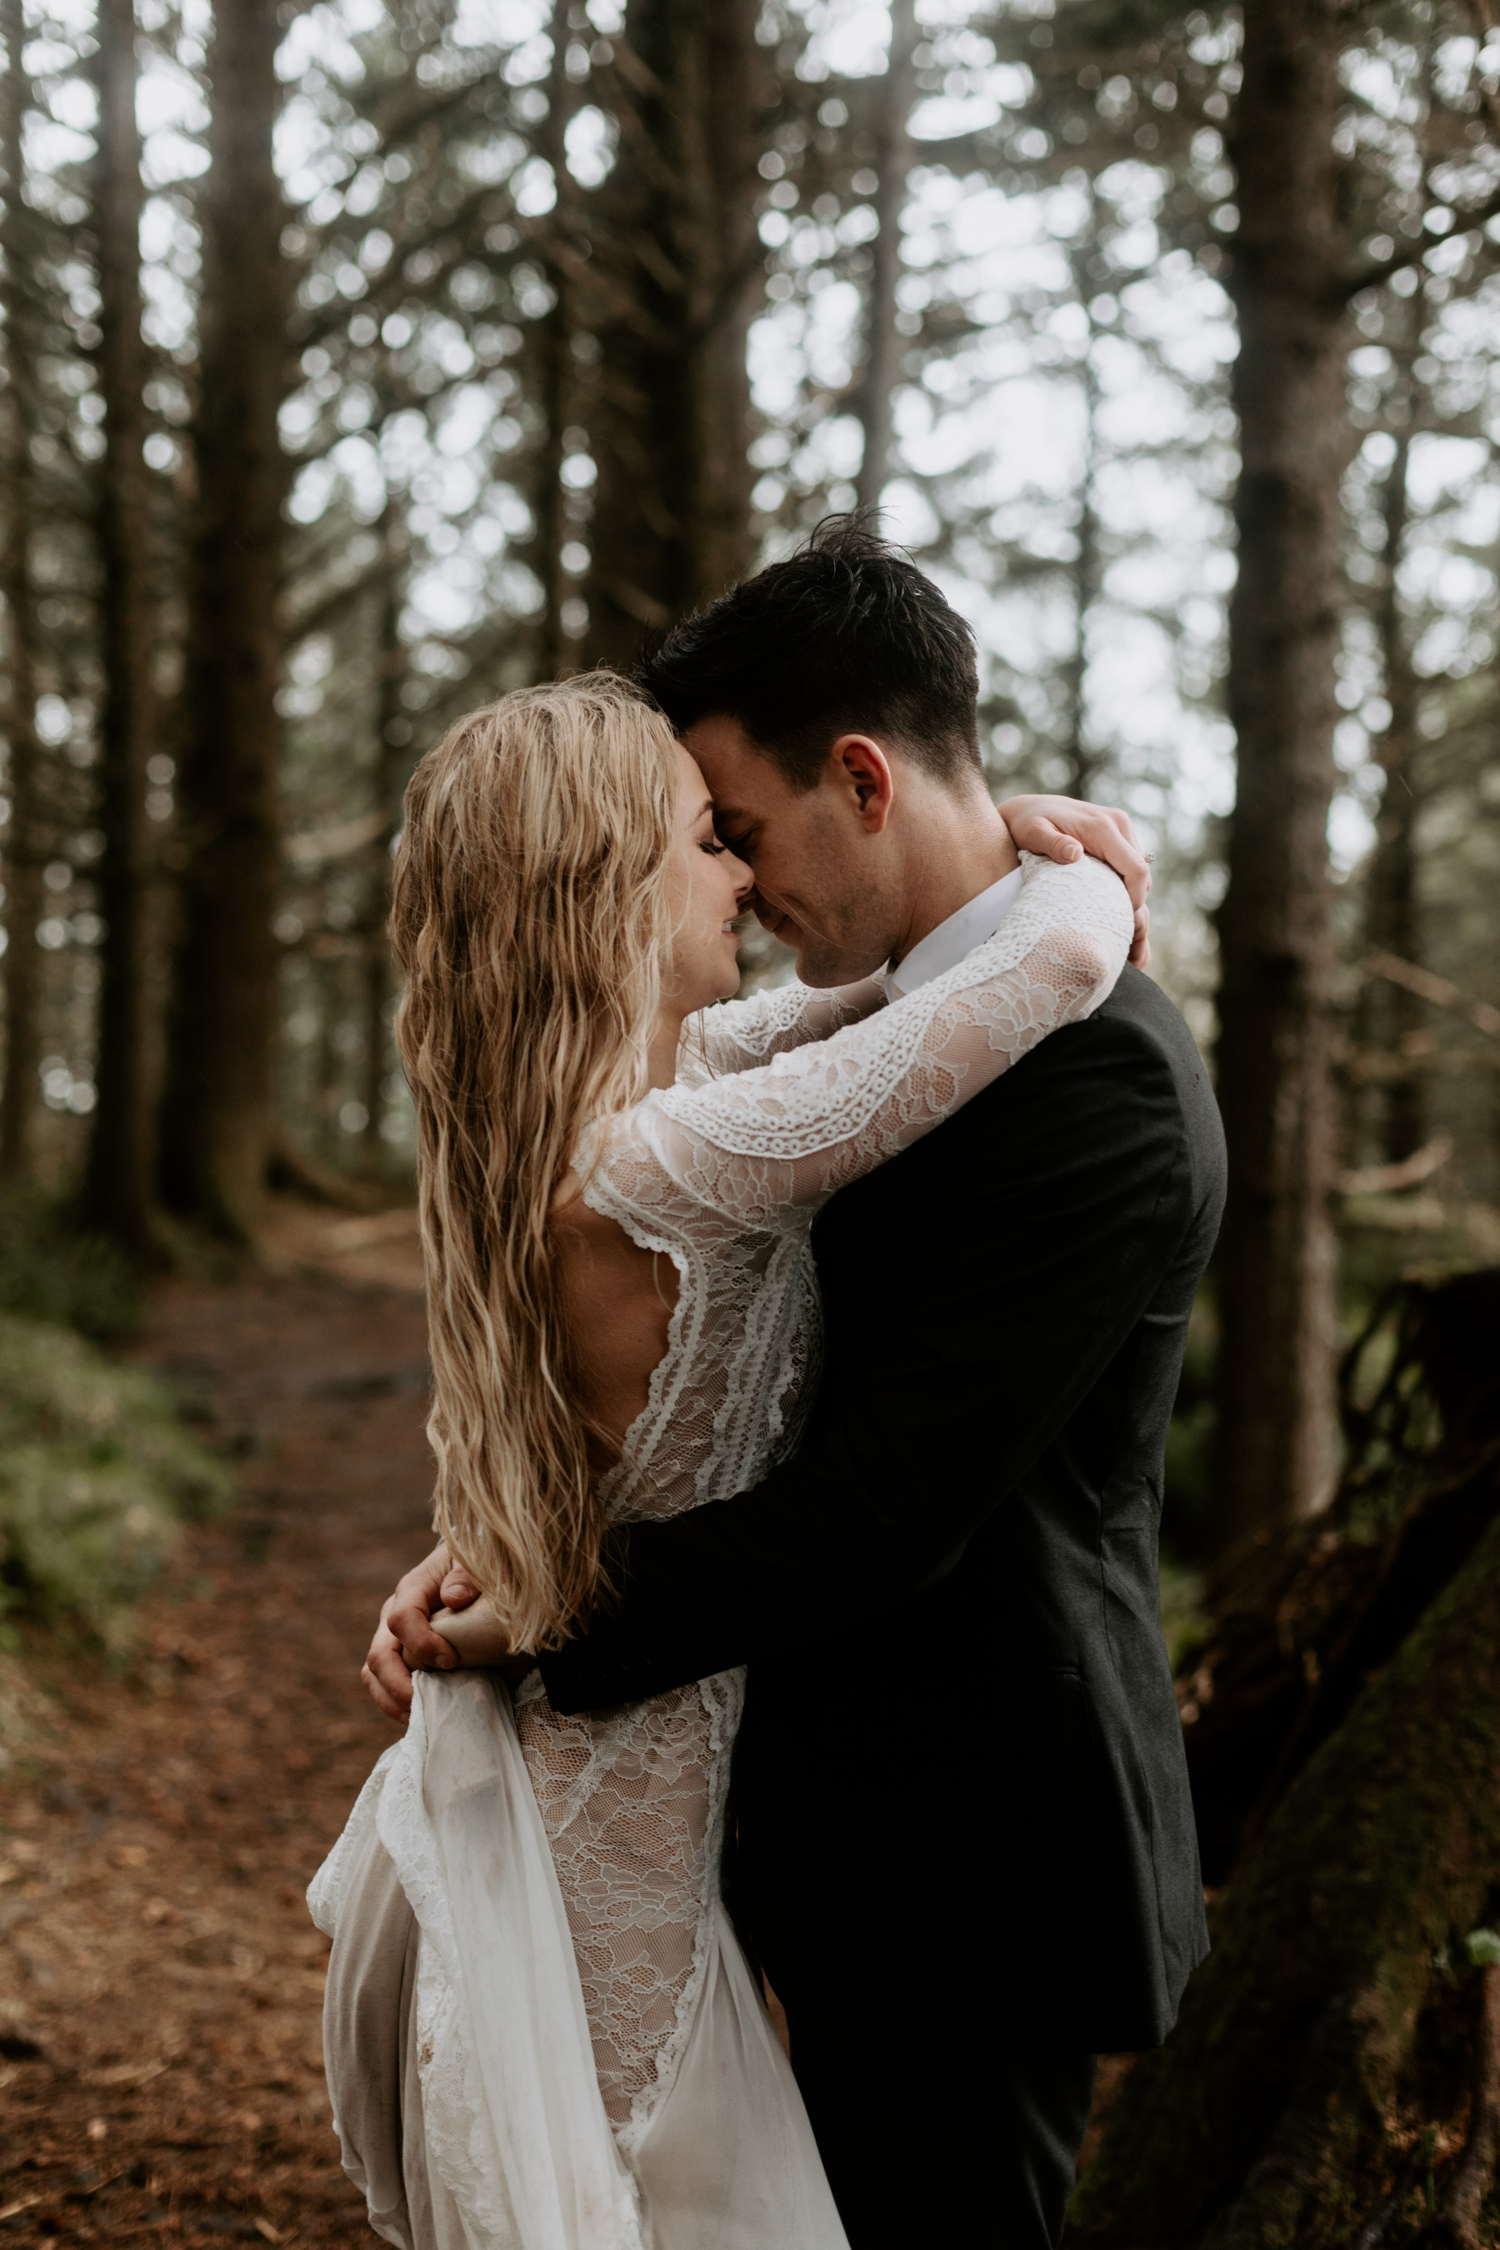 pnw-adventure-wedding-photographer-2018-05-02_0071.jpg